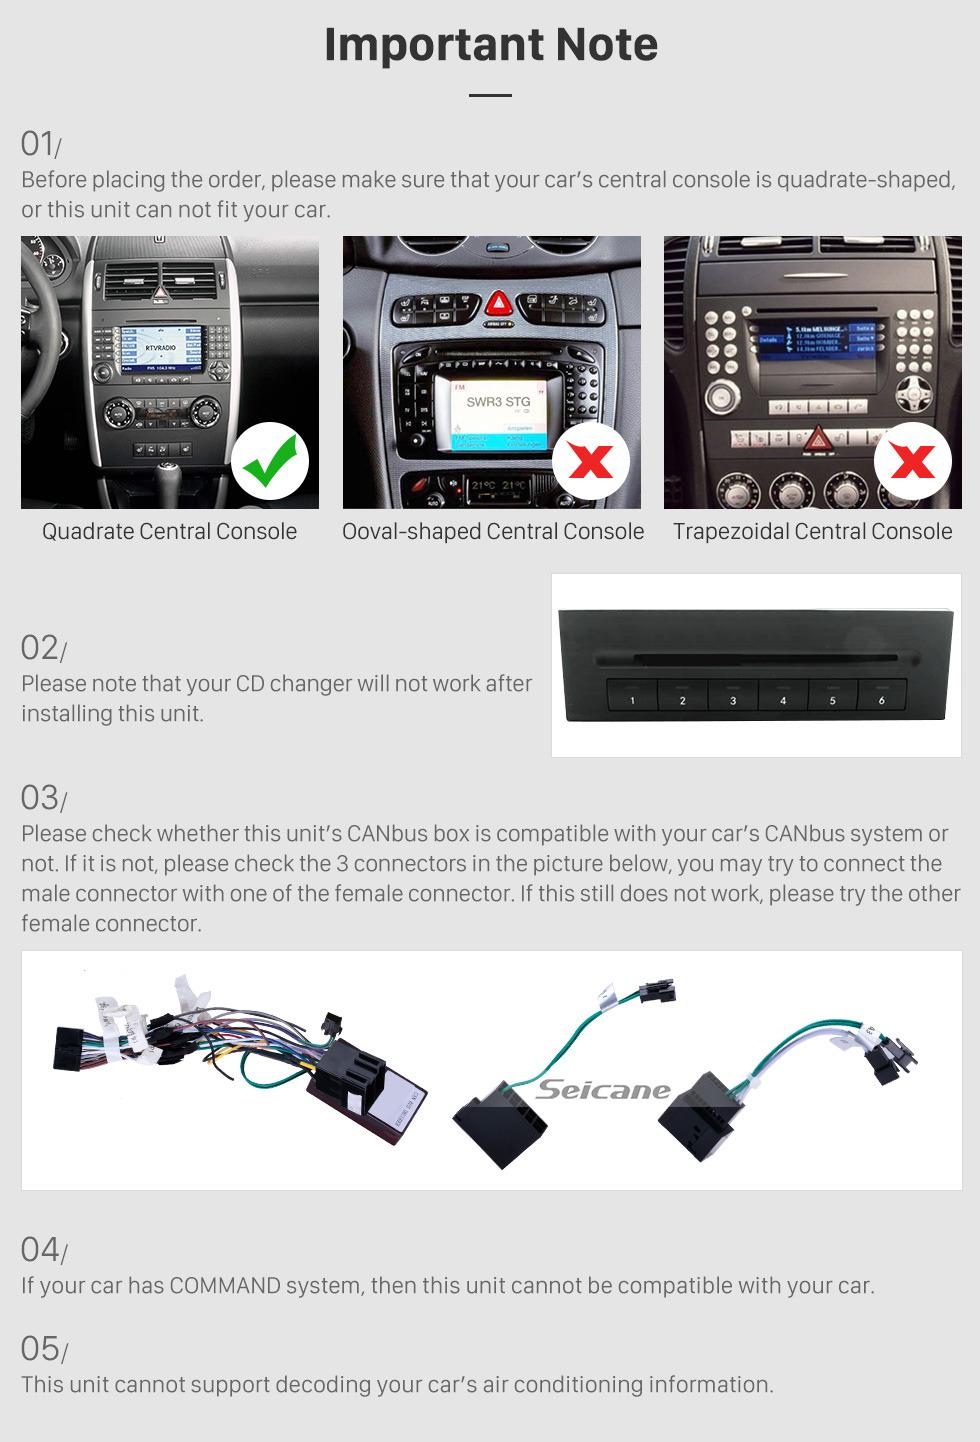 Seicane 9 inch 1024*600 touchscreen Radio for 2006-2012 Mercedes Benz Sprinter 211 CDI 309 CDI 311 CDI 509 CDI Benz A-class W169 A150 A170  Benz B-class W245 B170 B200 Benz Viano Vito W639  Benz W315 W318 Android 9.0 In Das